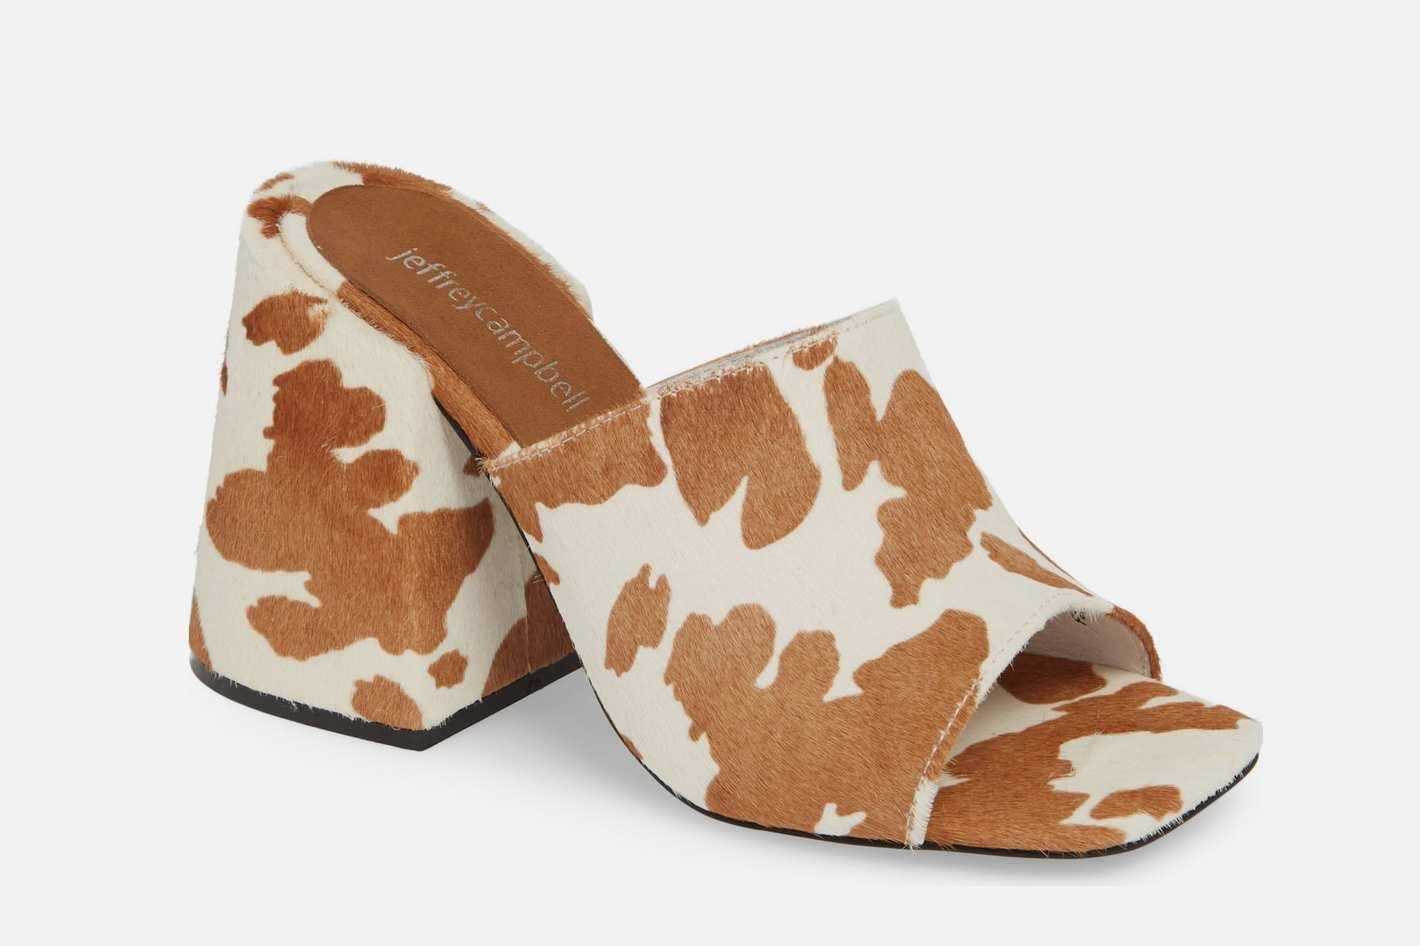 Jeffrey Campbell Colossal Big Heel Genuine Calf Hair Mule